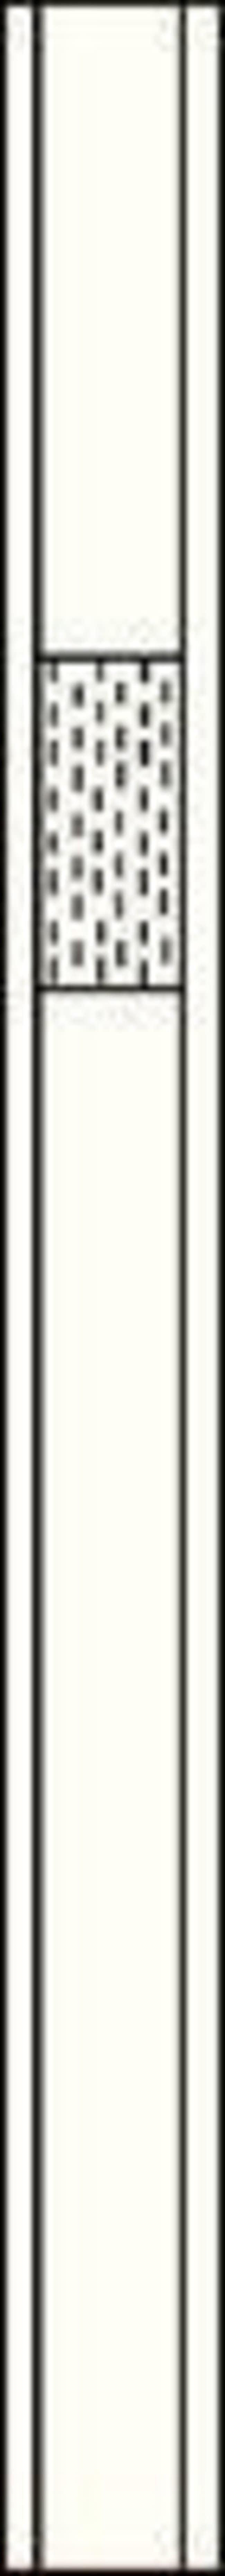 Trajan Varian SPI Liner:Chromatography:Chromatography Supplies